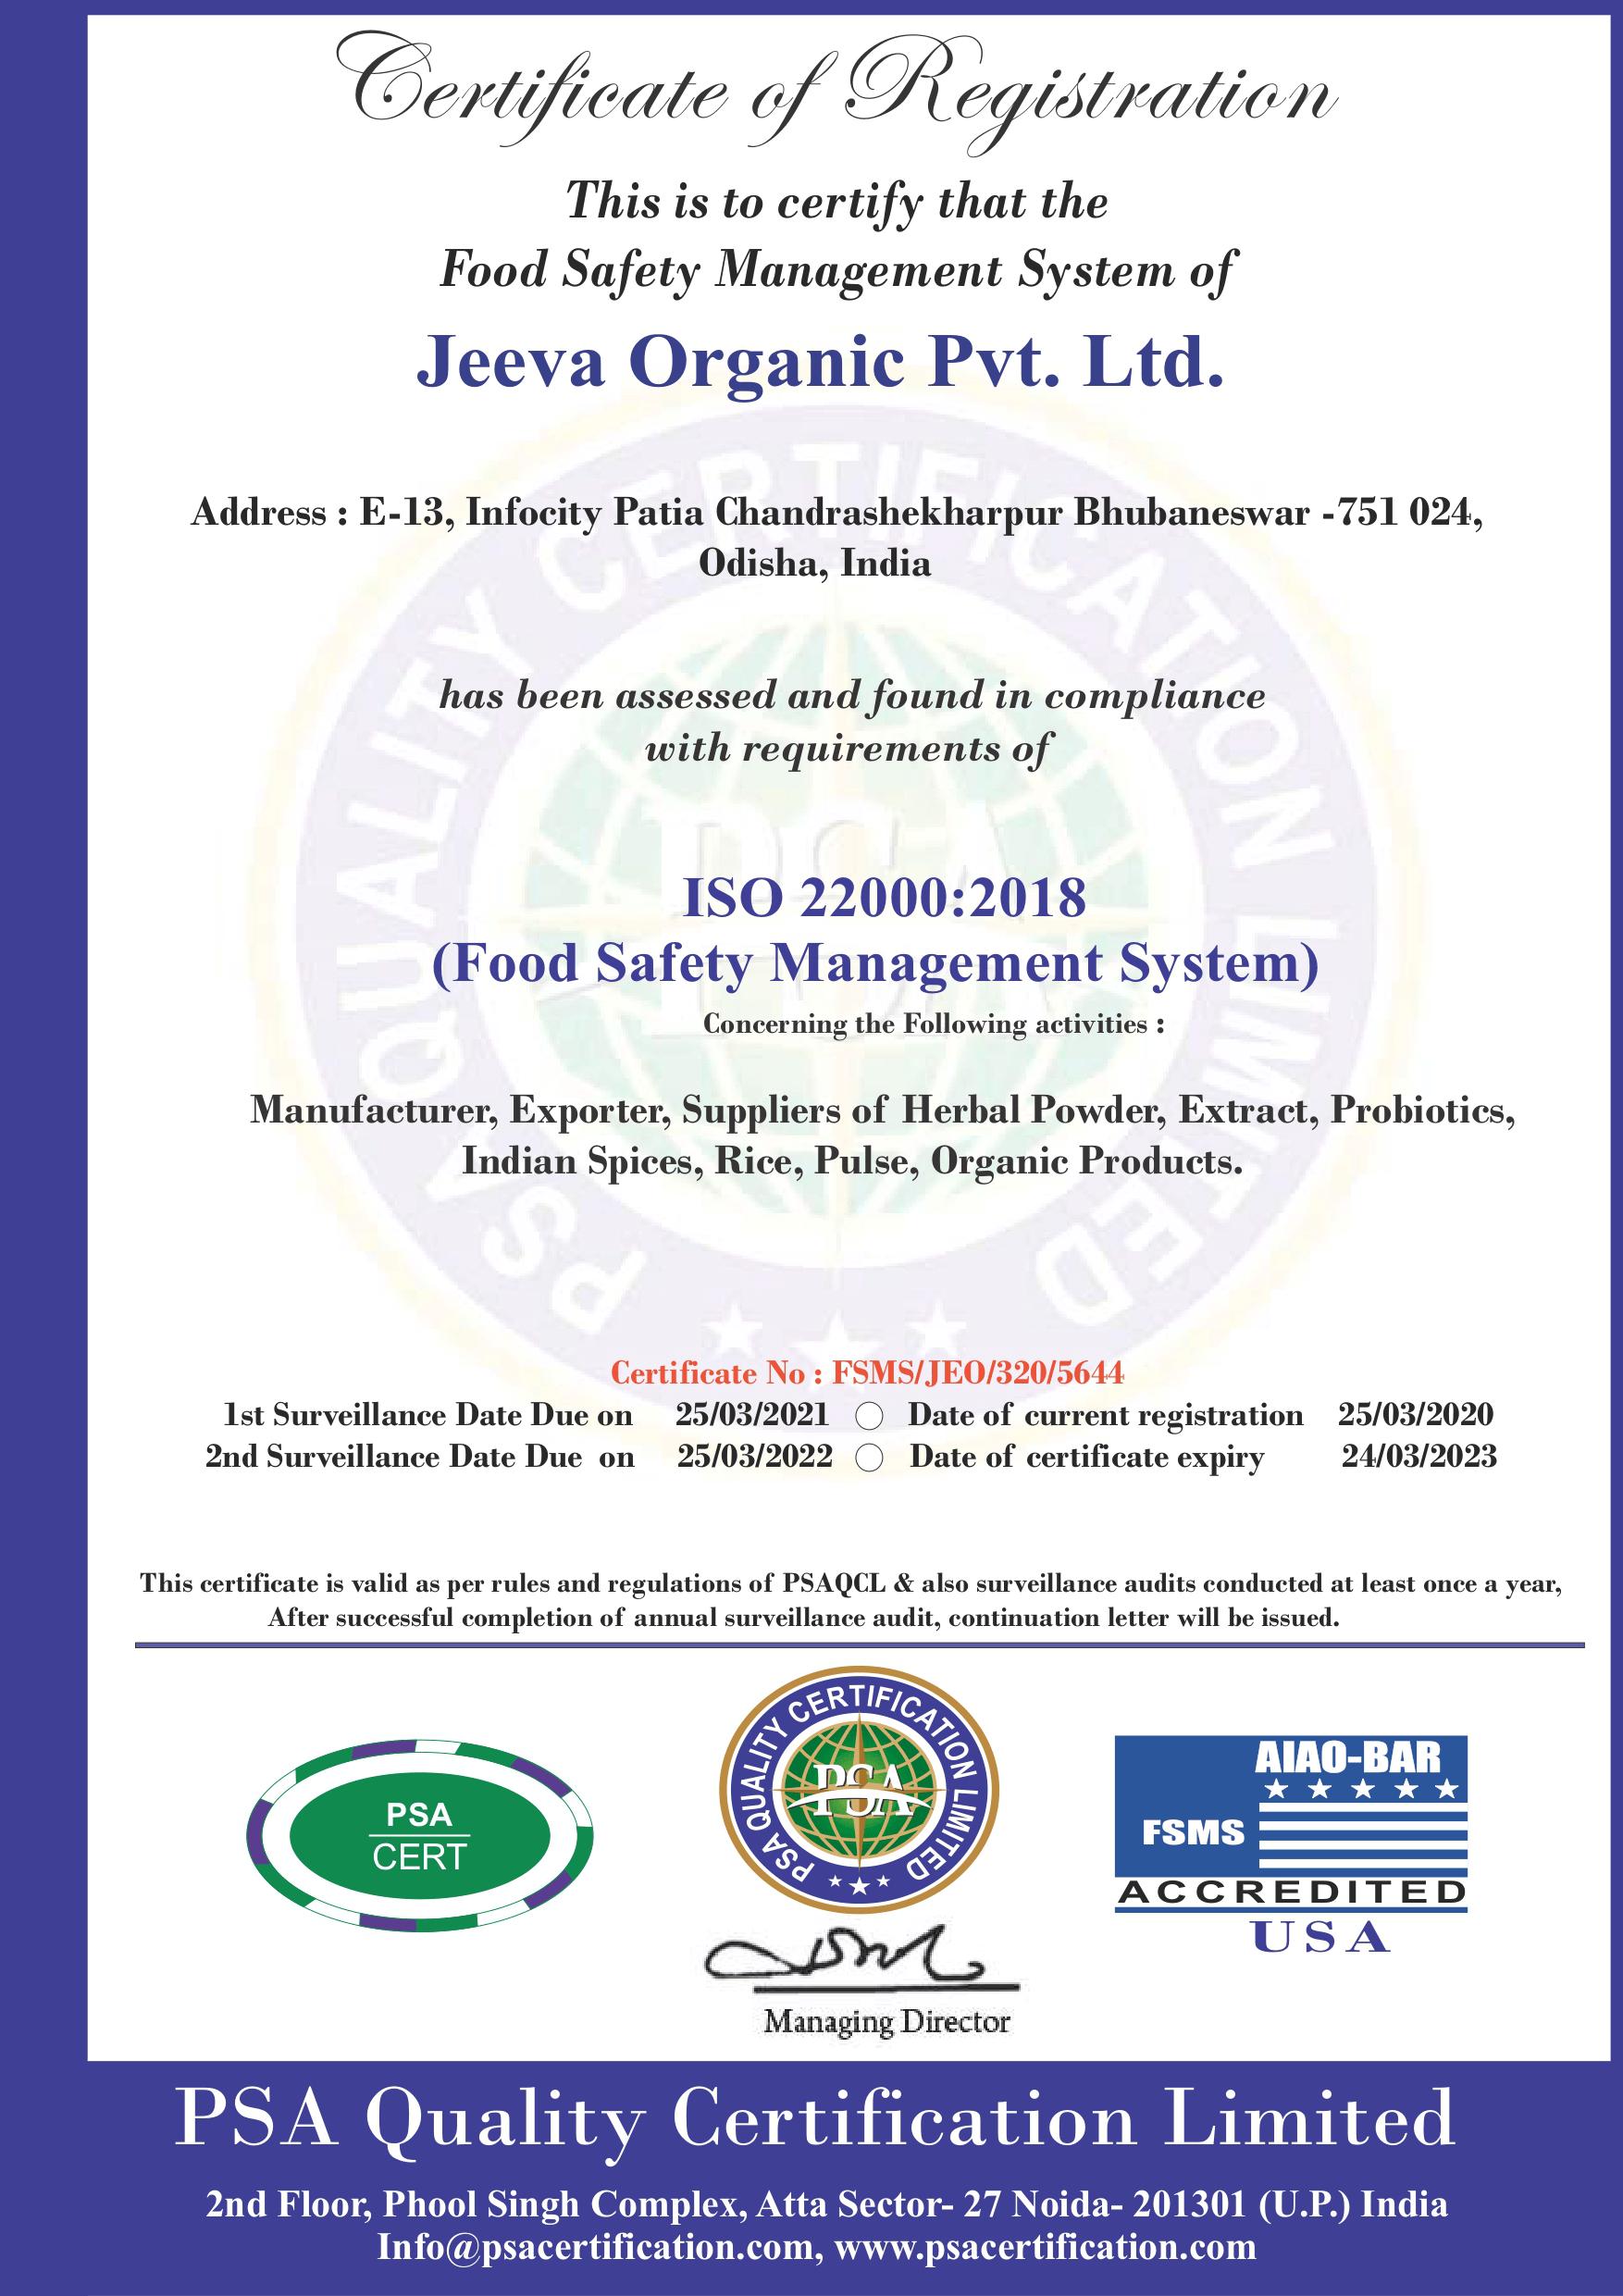 ISO 22000 Certificate - Jeeva Organic